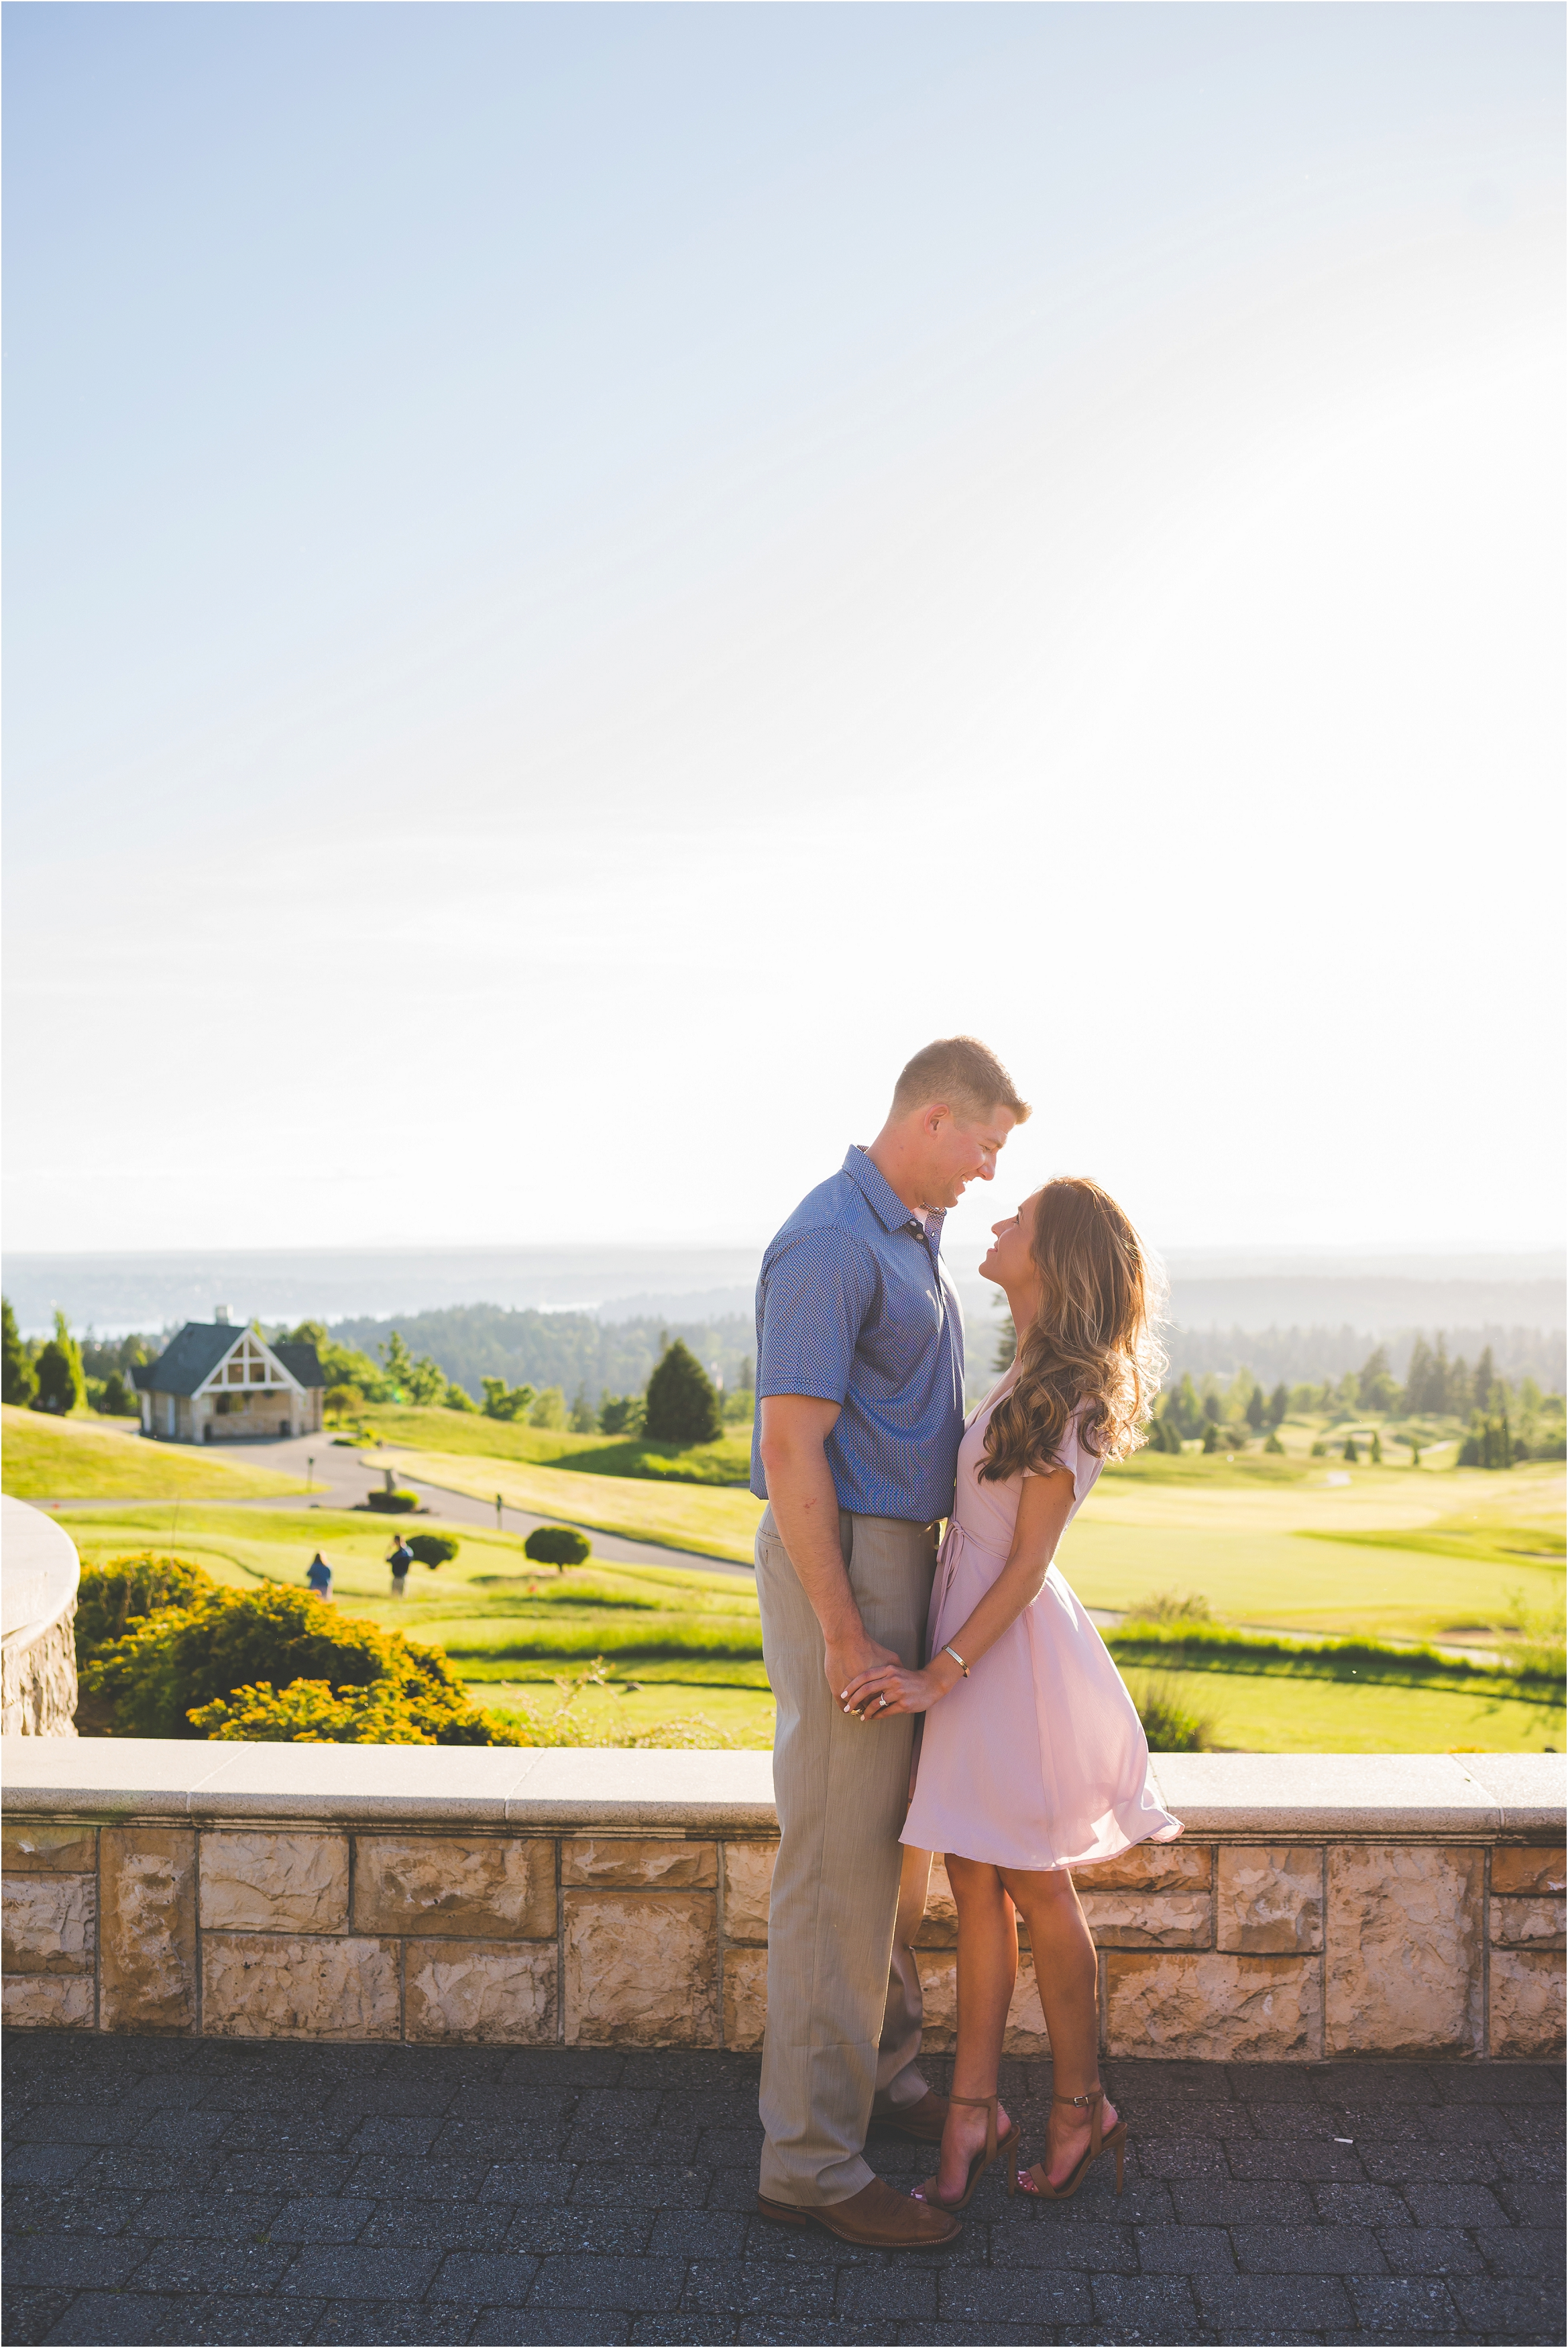 newcastle-golf-club-proposal-jannicka-mayte-seattle-washington-engagement-wedding-photographer_0028.jpg